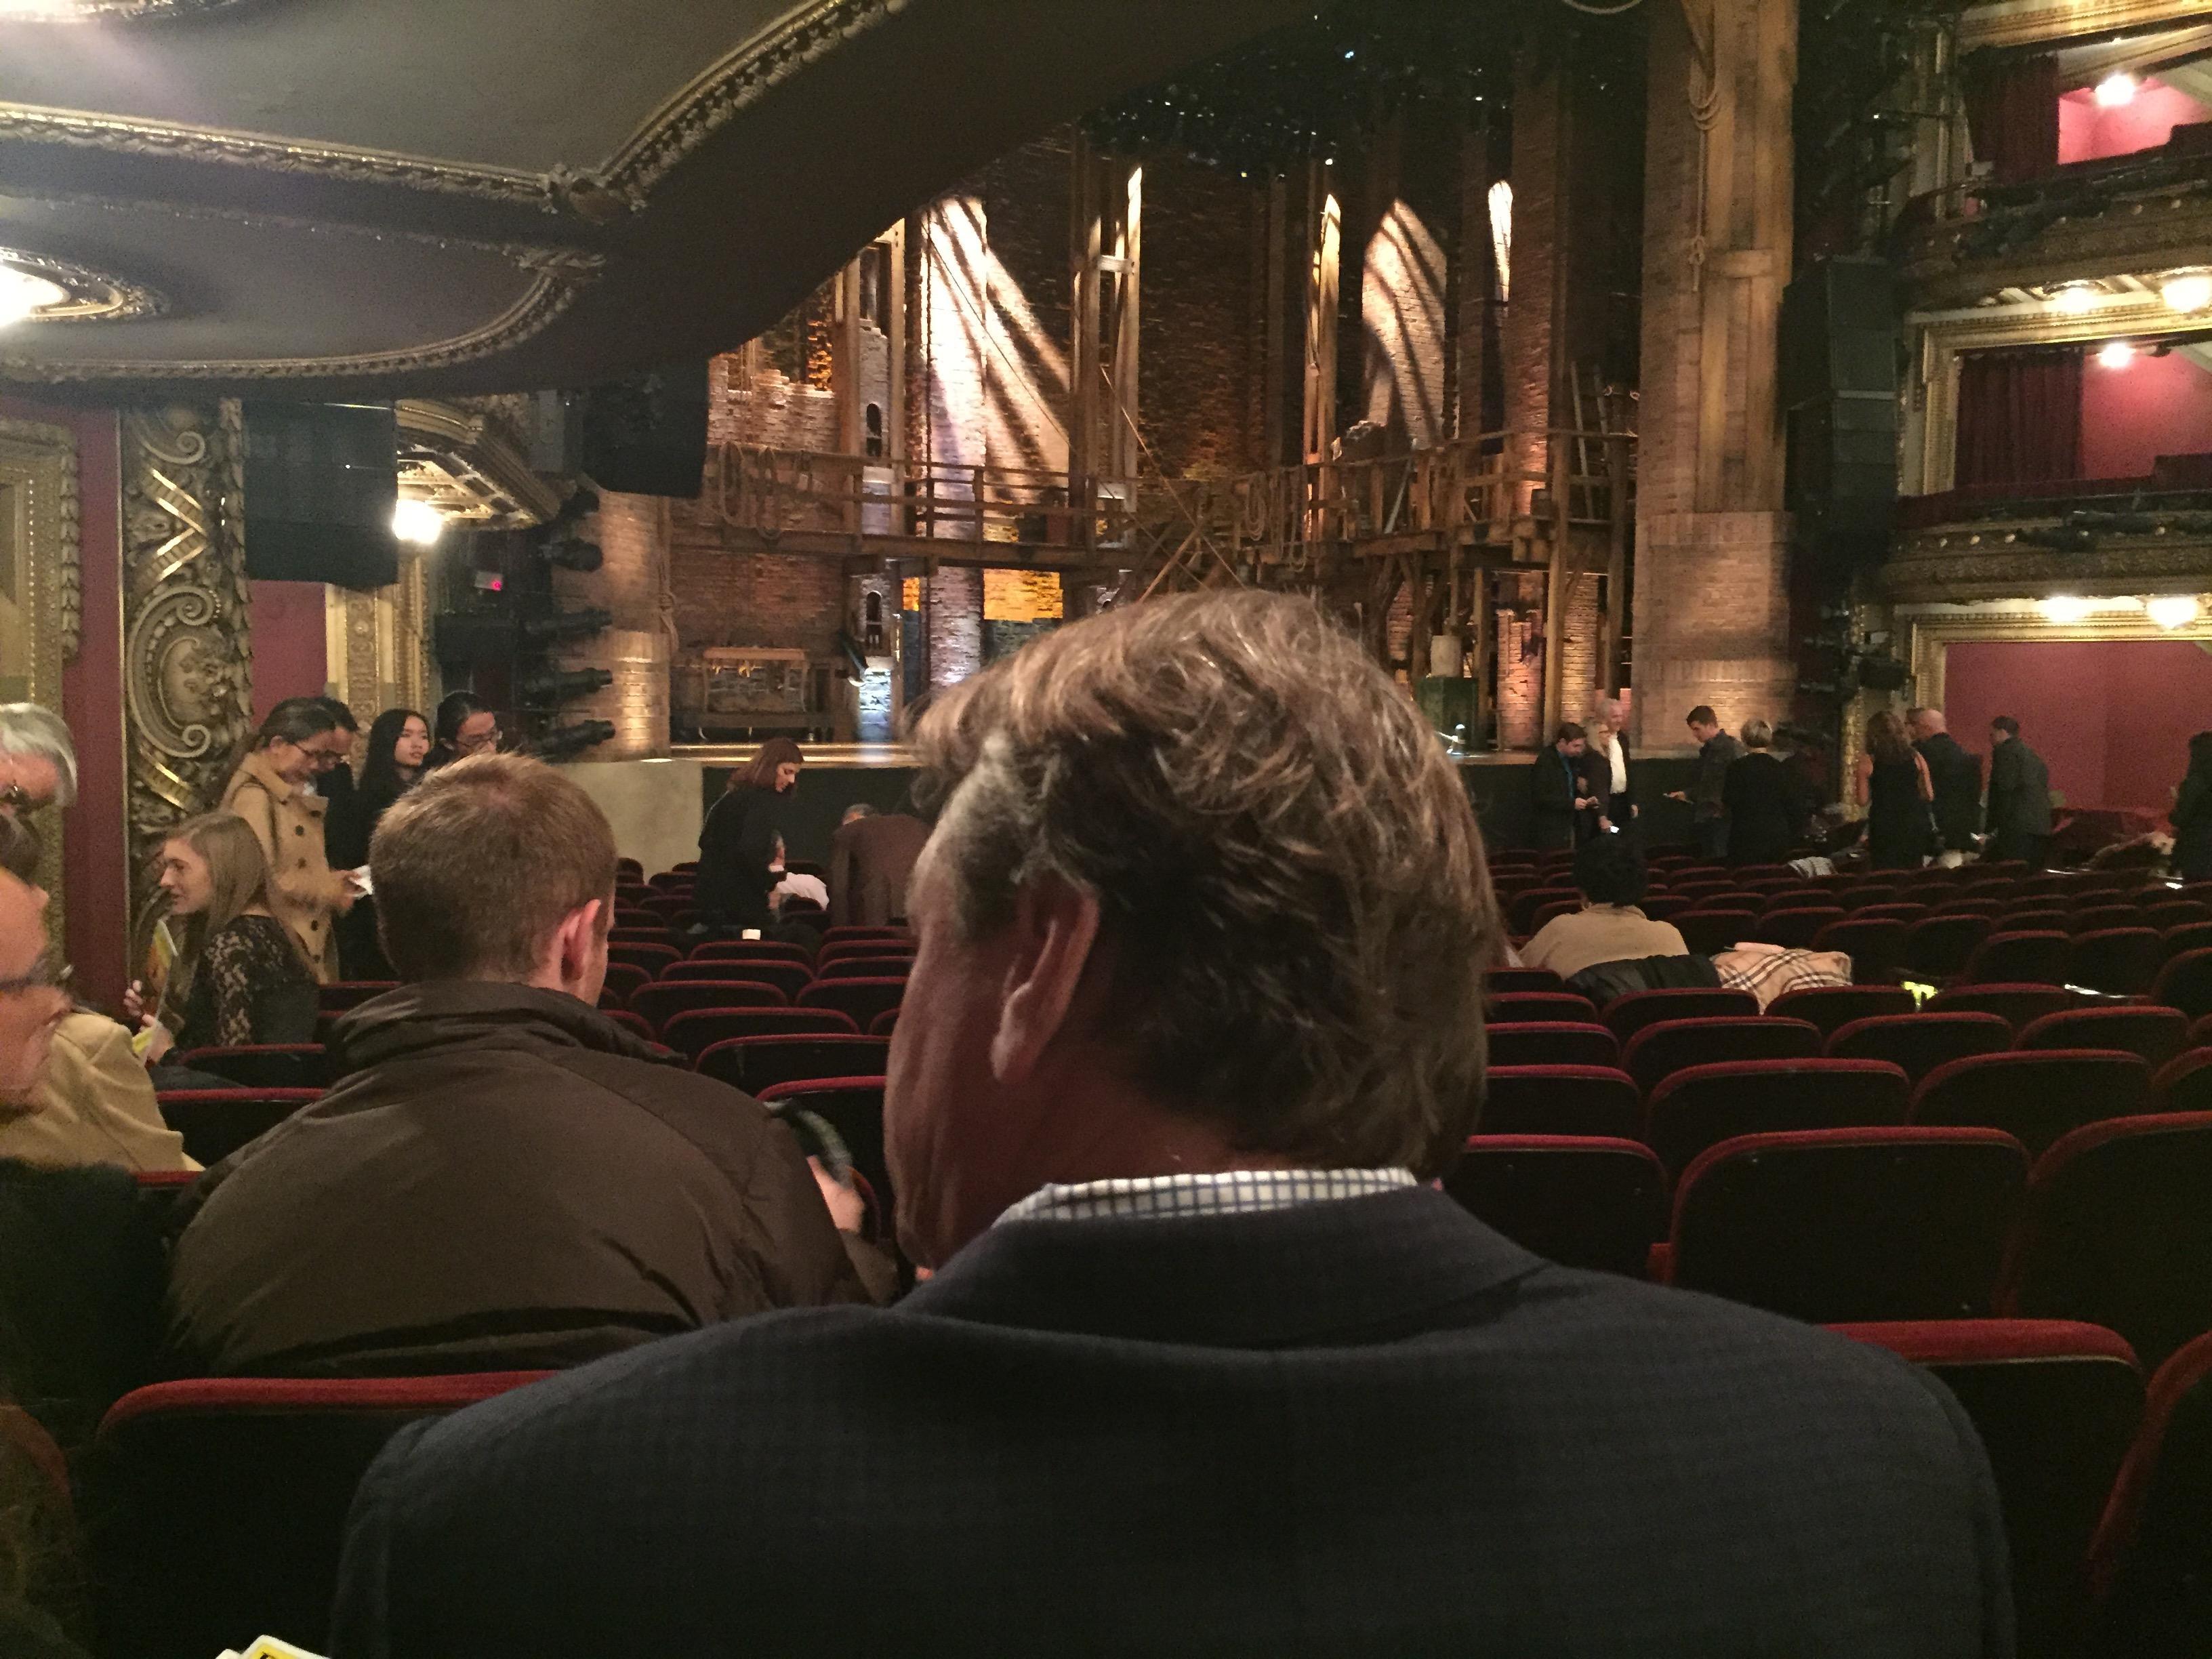 CIBC Theatre Section Orchestra L Row S Seat 17